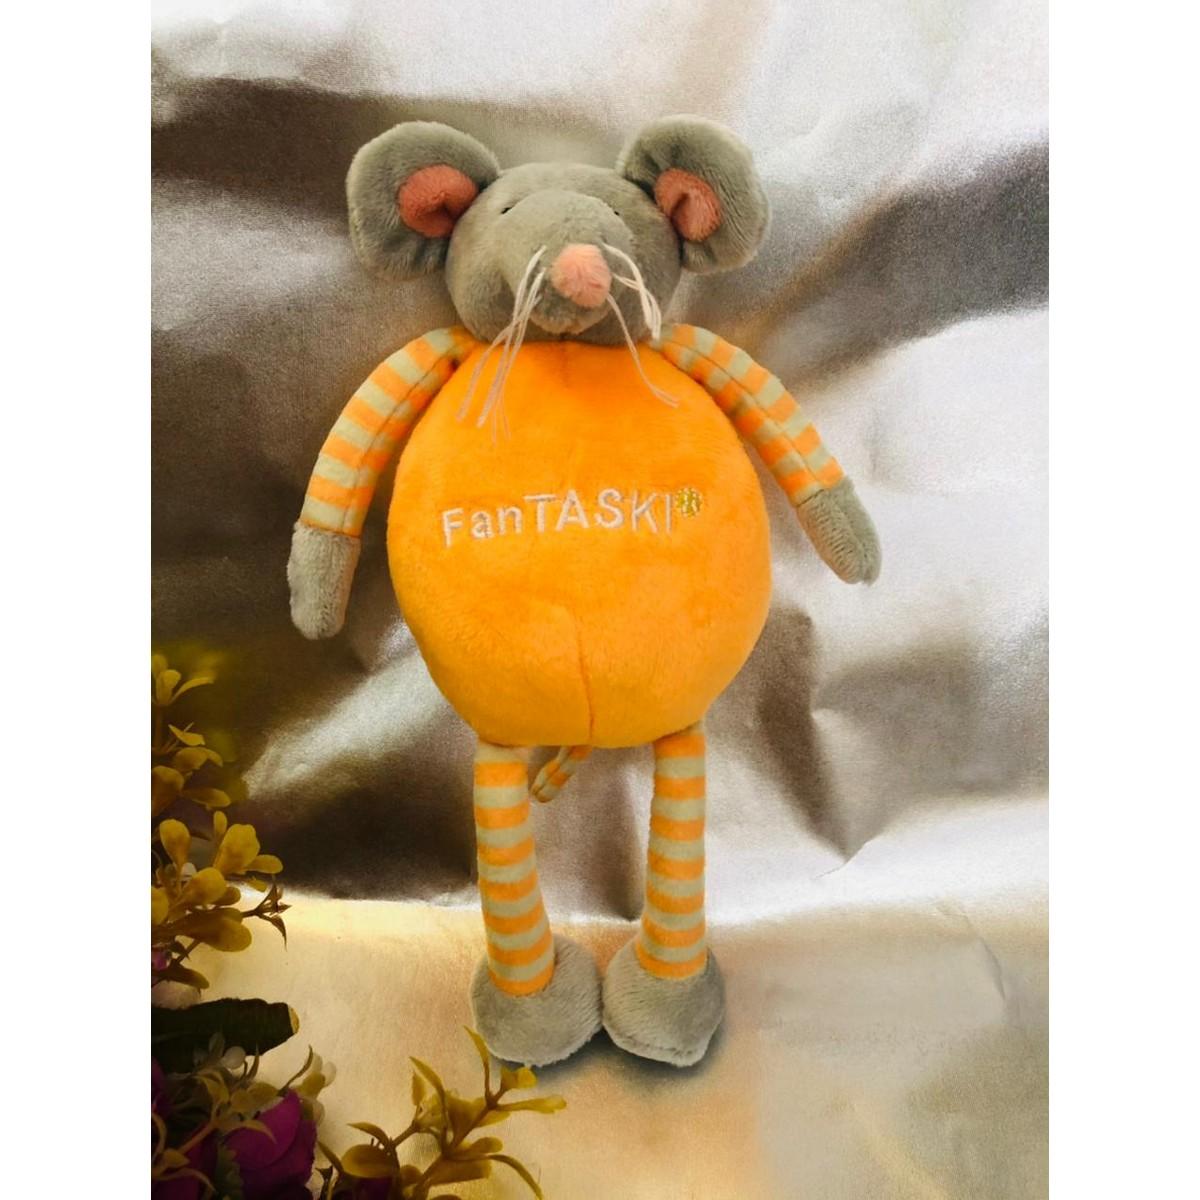 Stuff Toy Premium Rat Plush Stuffed Animal toy For Boys And Girls